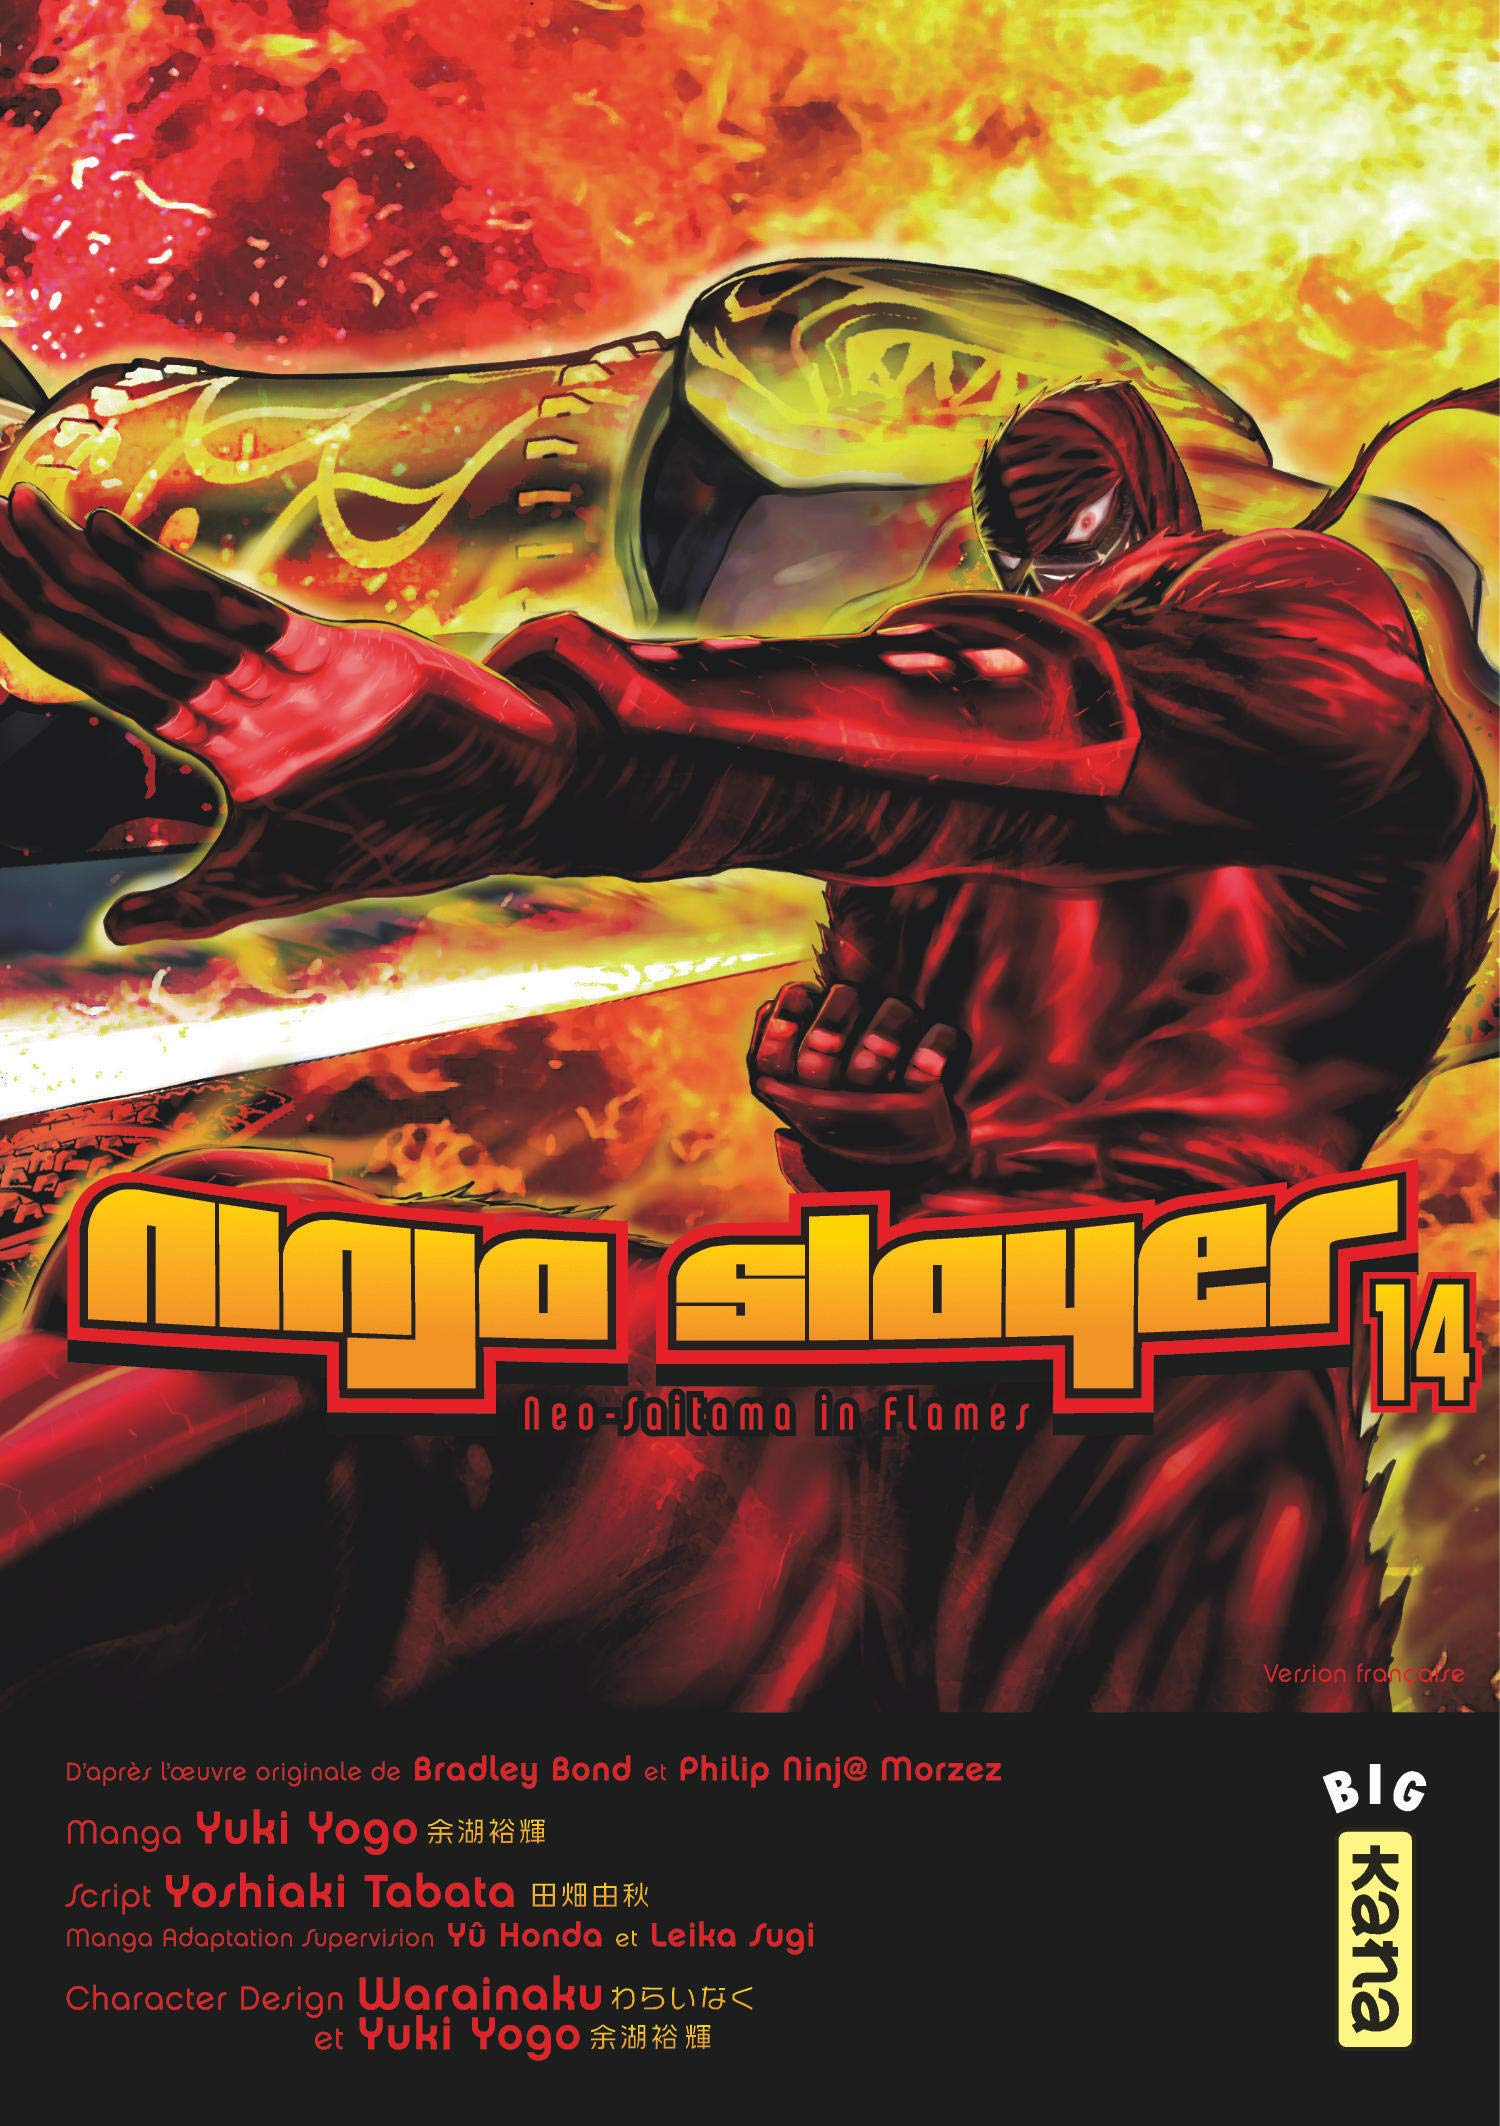 Ninja slayer, tome 14: Amazon.es: Yoshiaki Tabata, Yuki Yogo ...